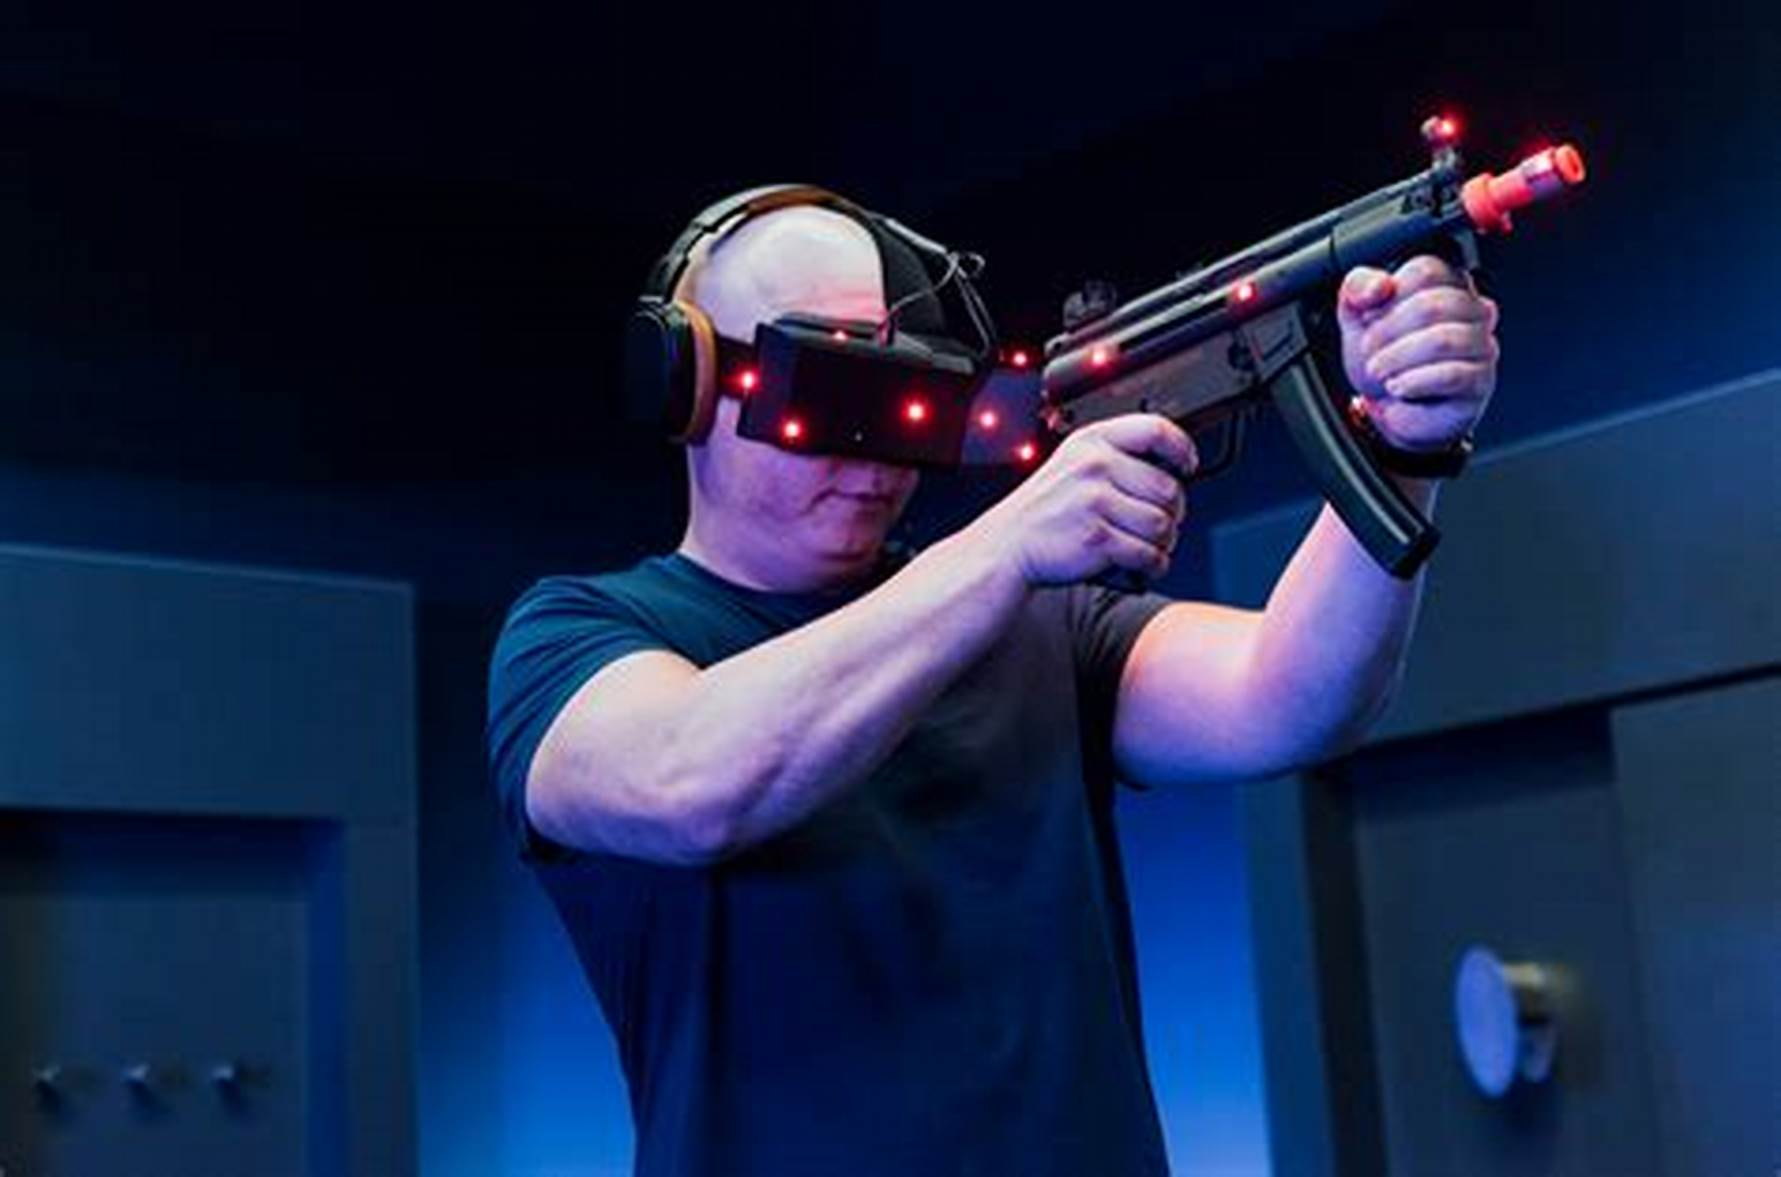 VR影厅入寒冬? 纽约、上海IMAX影厅陆续关闭